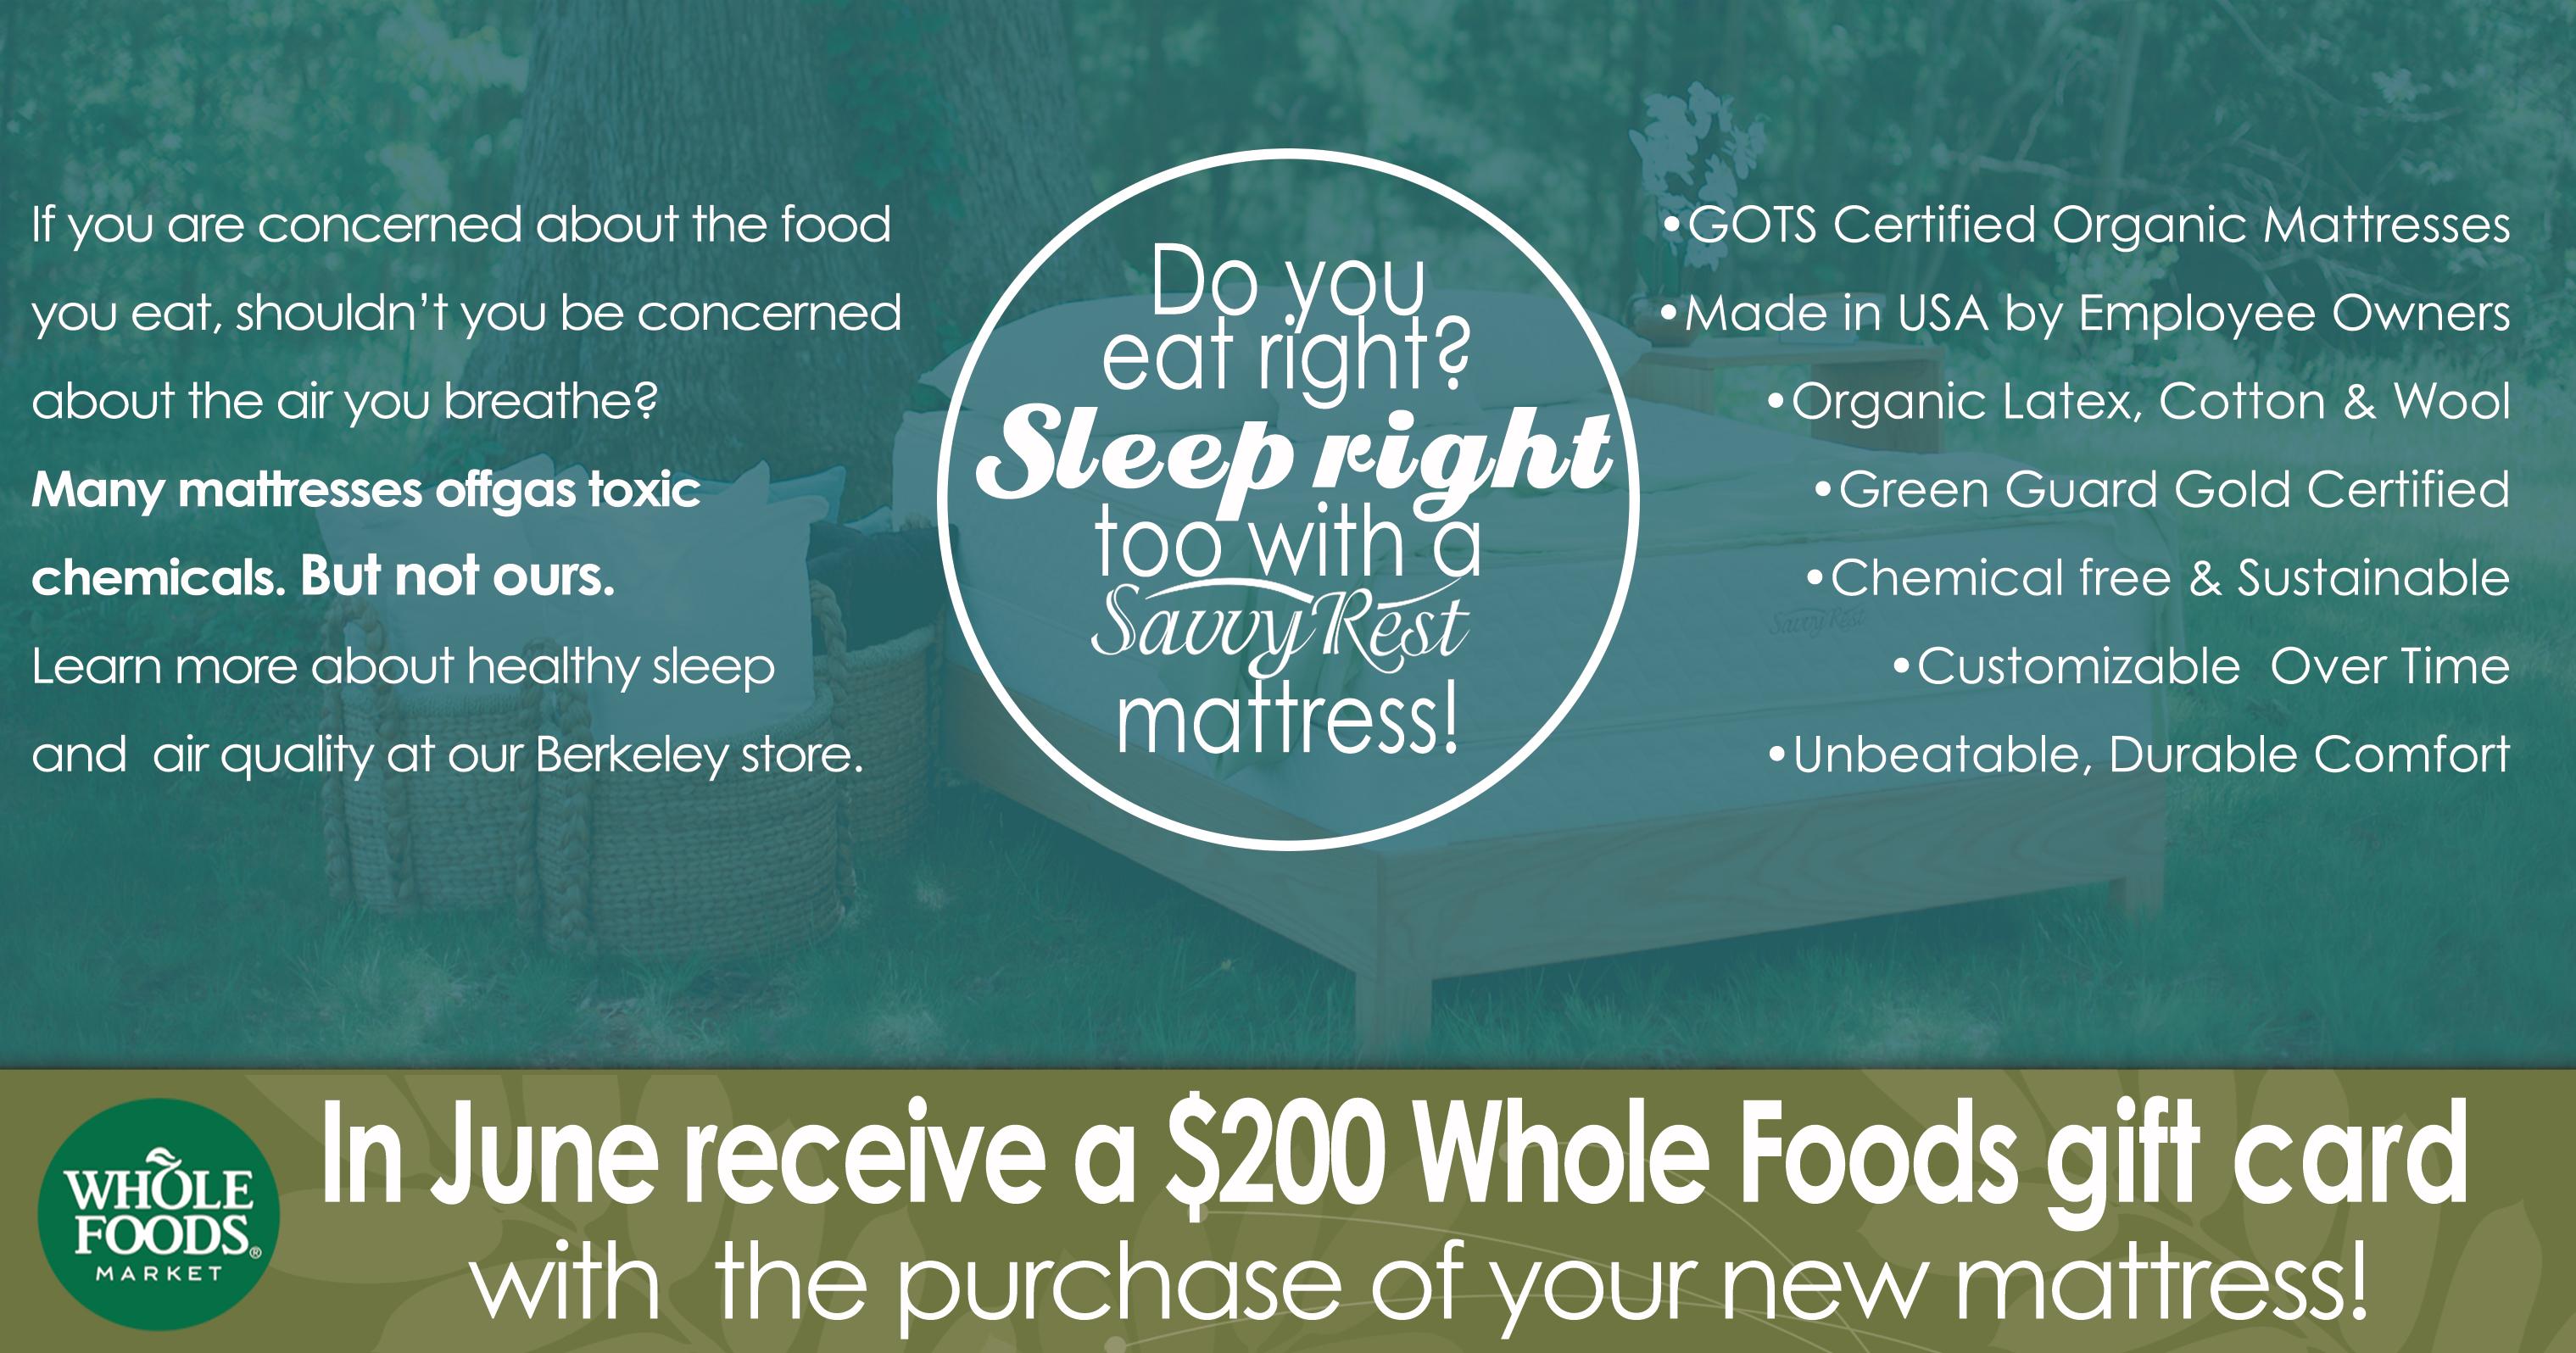 Whole Food Promotion Berkeley